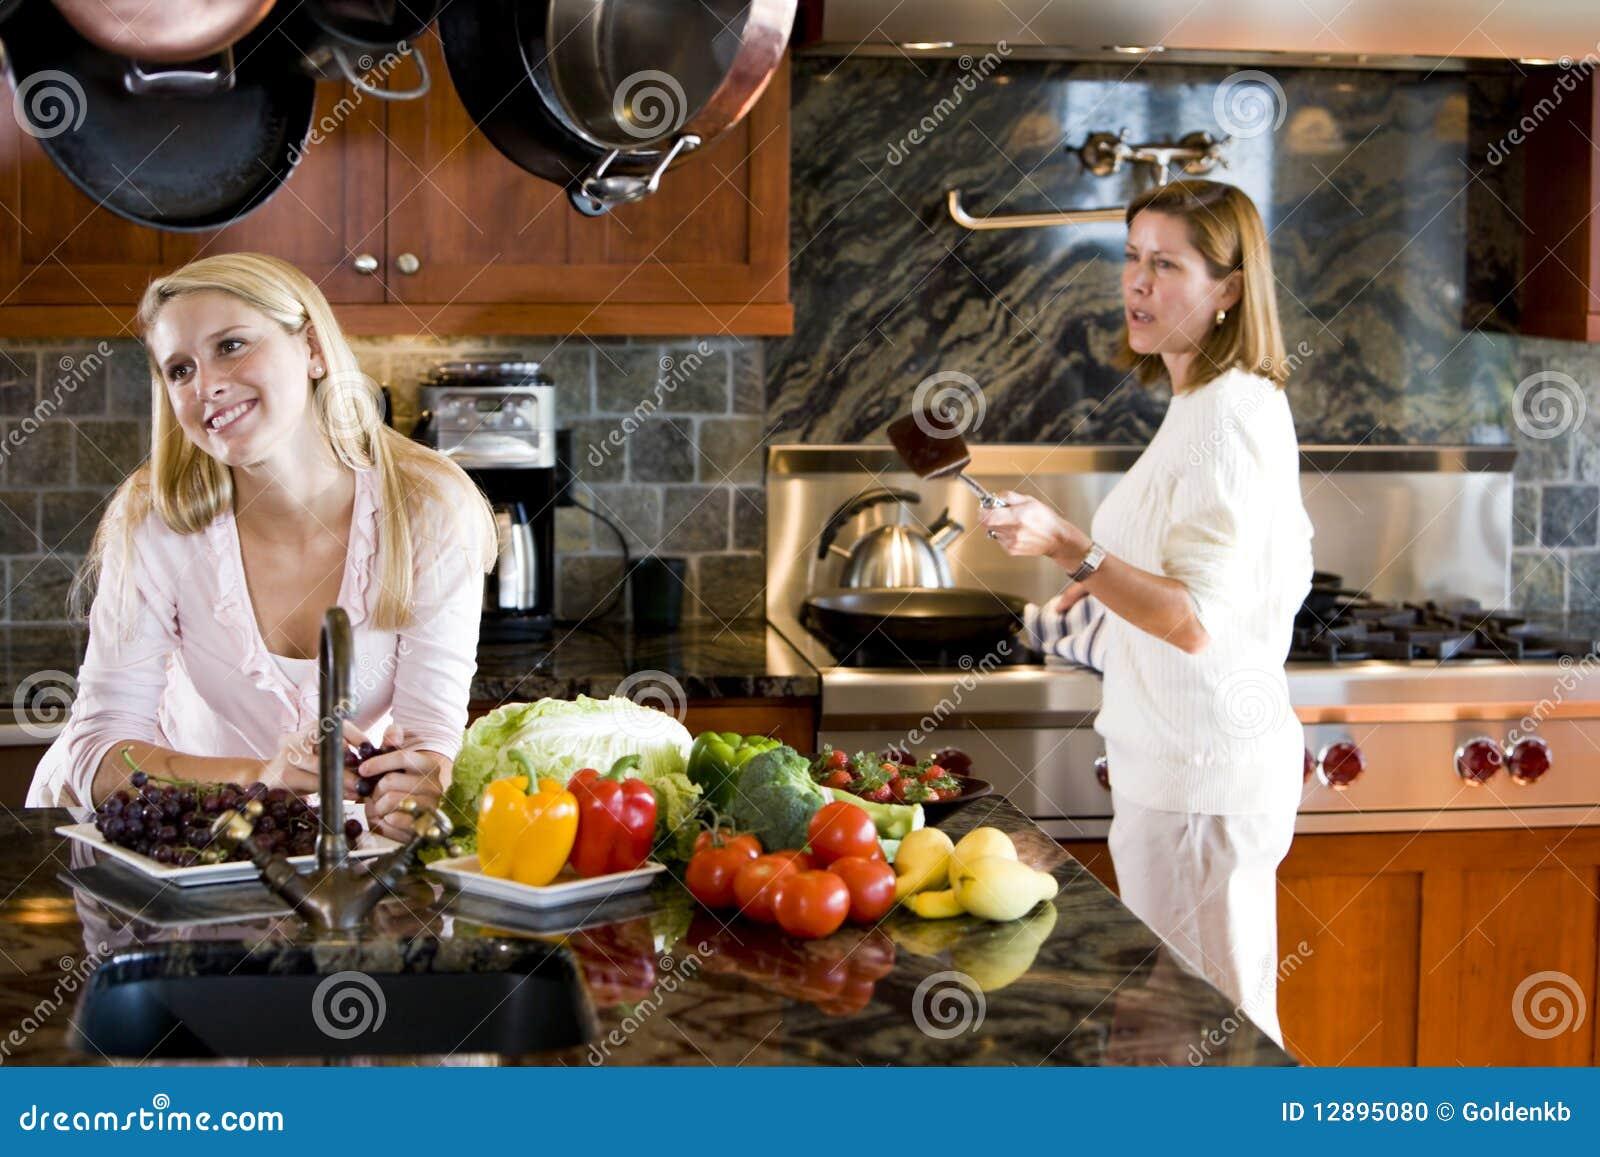 Adolescente heureuse dans la cuisine avec la mère